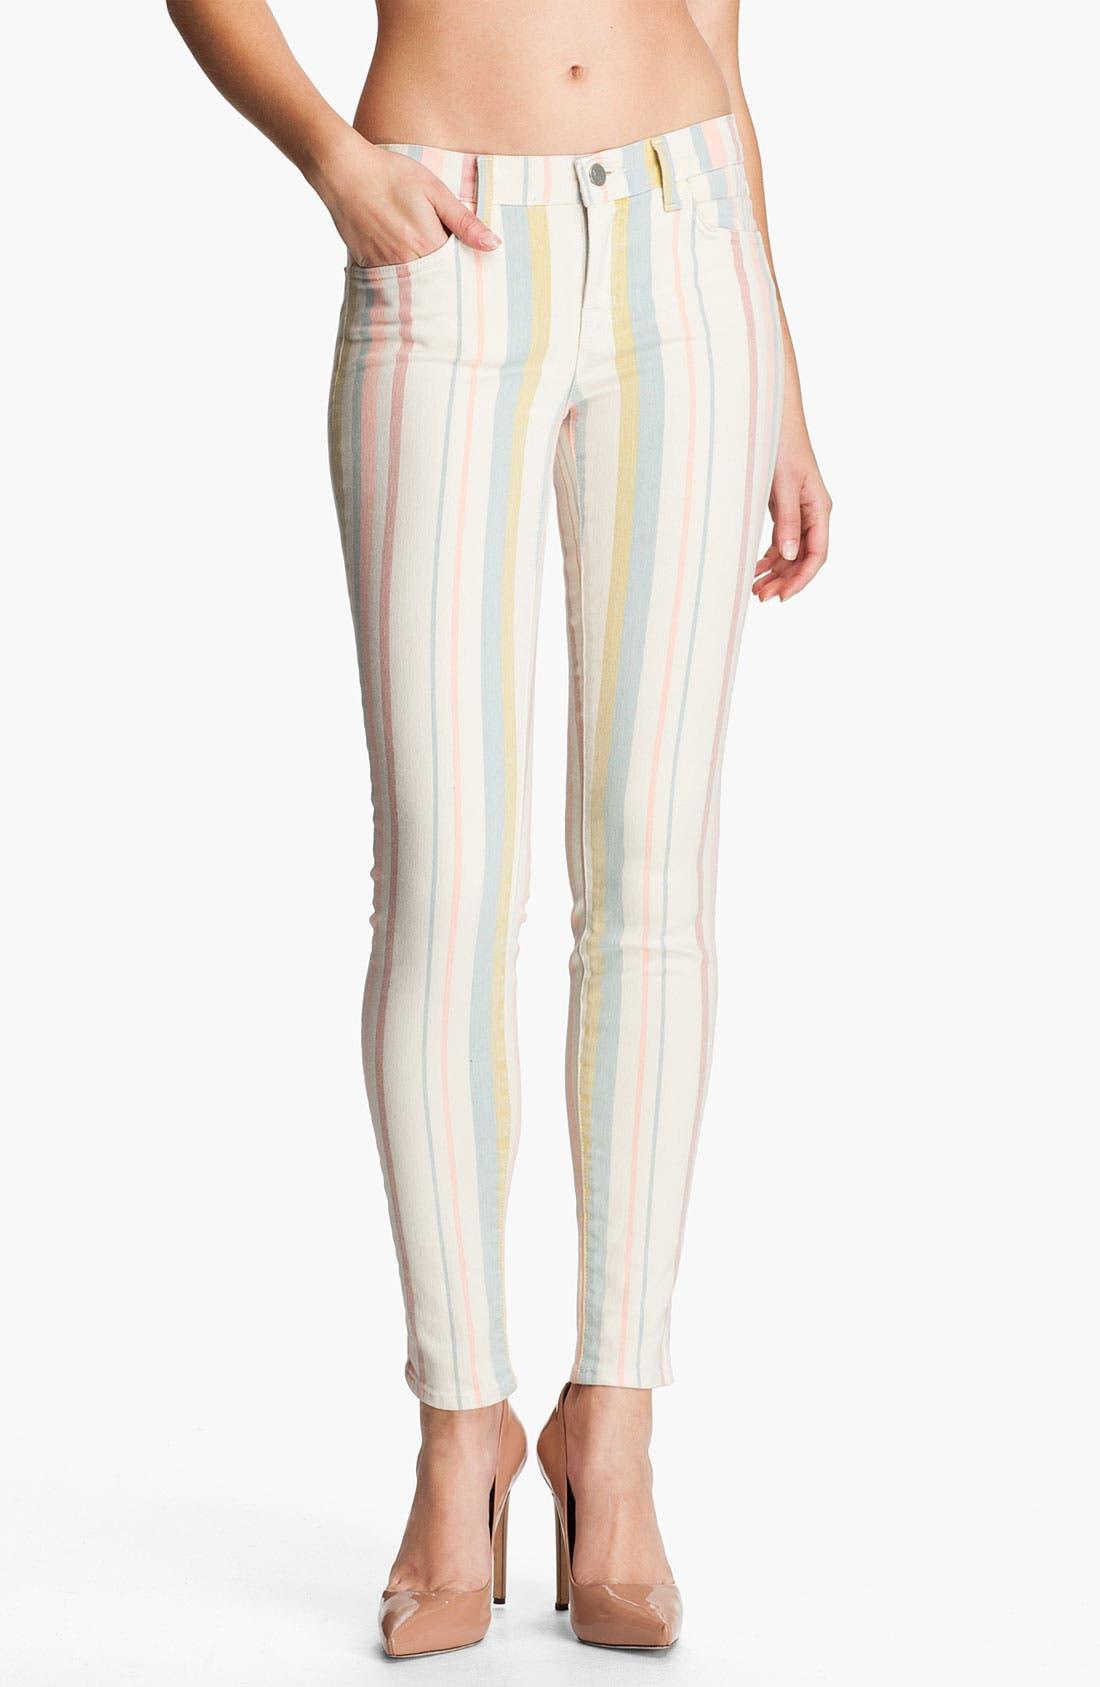 Alternate Image 1 Selected - J Brand Pastel Stripe Stretch Denim Skinny Jeans (Candy Stripe)